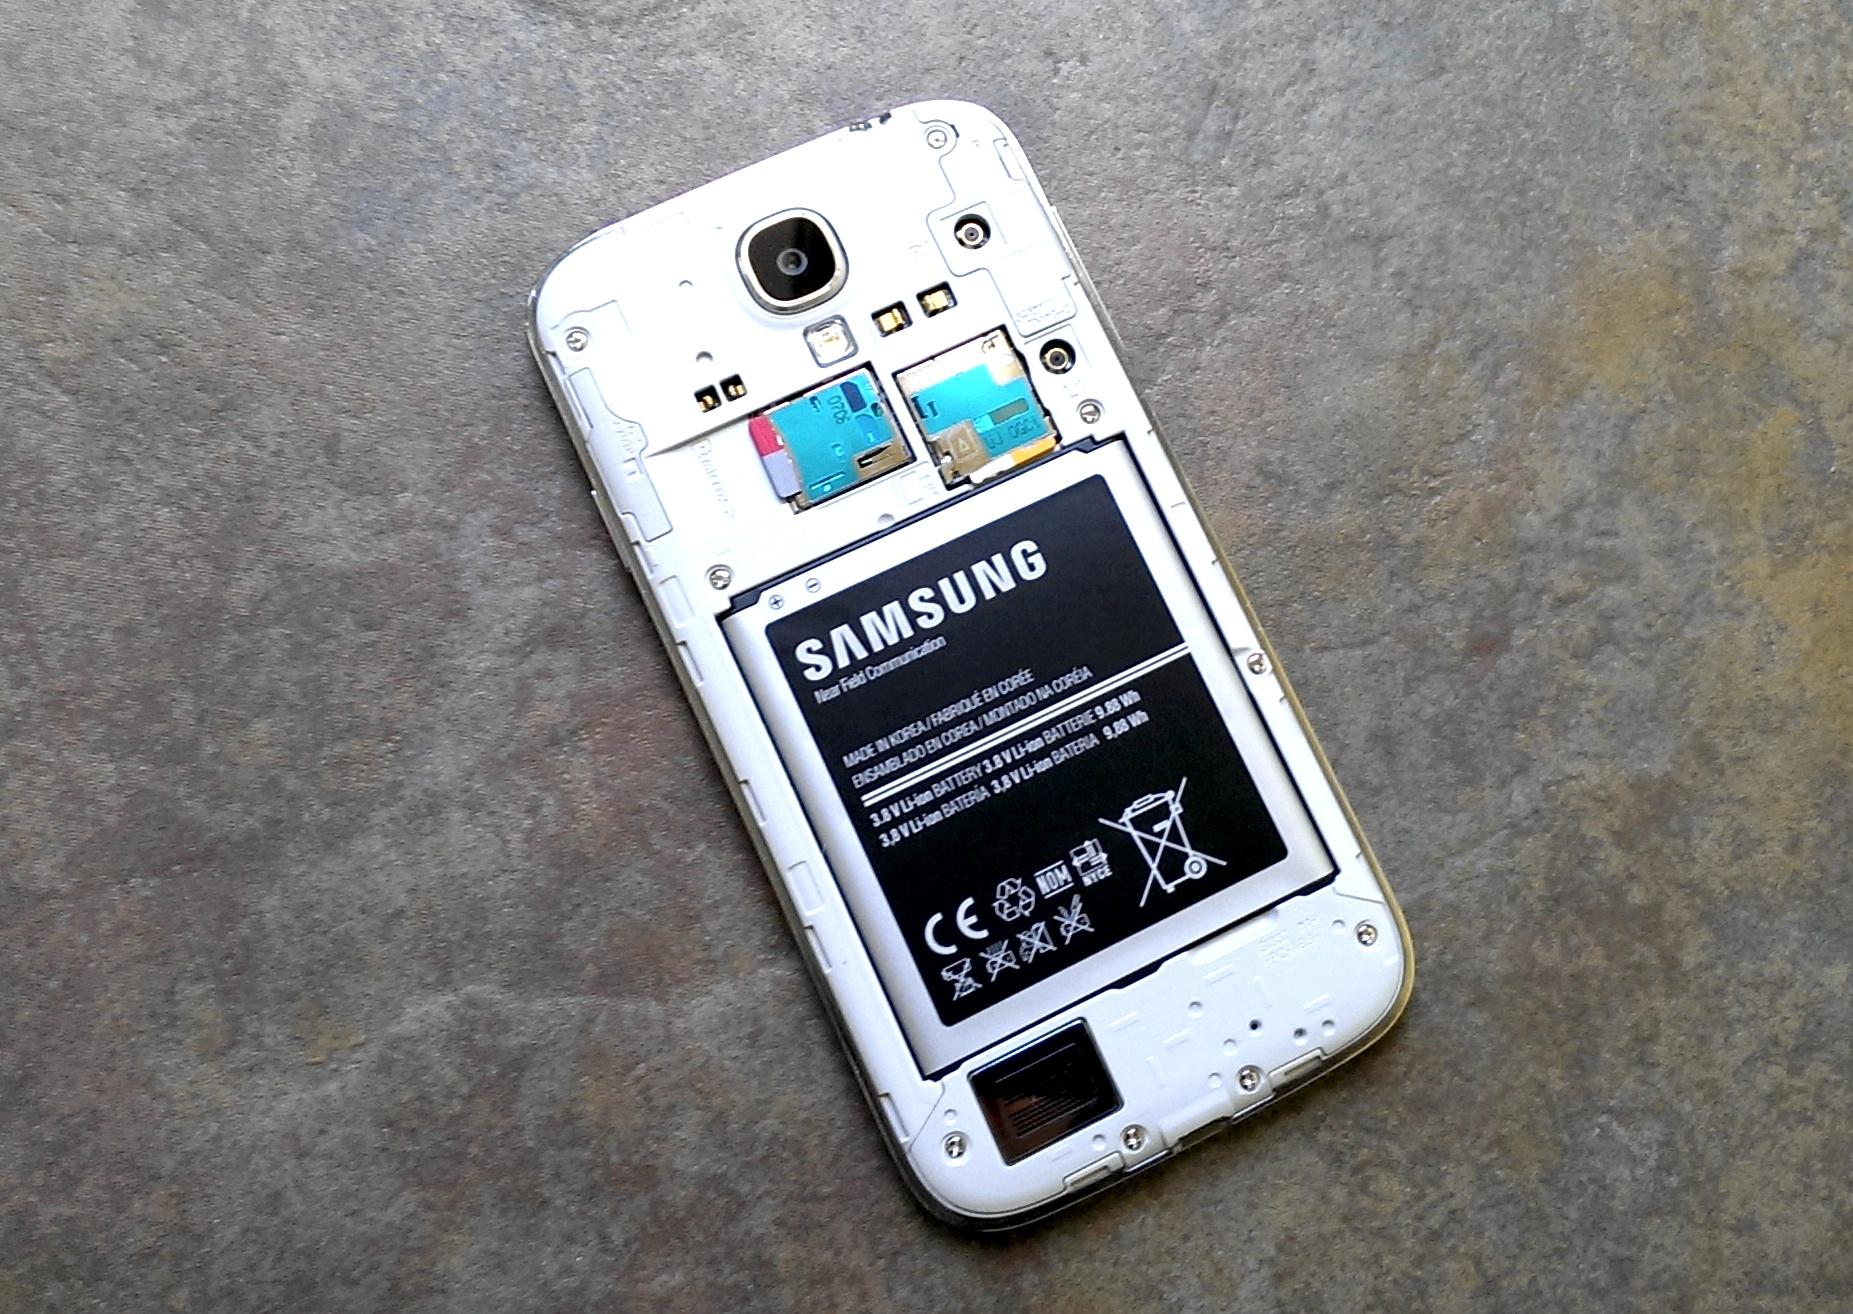 Samsung-Galaxy-S4-Micro-SD-Card-Worthless